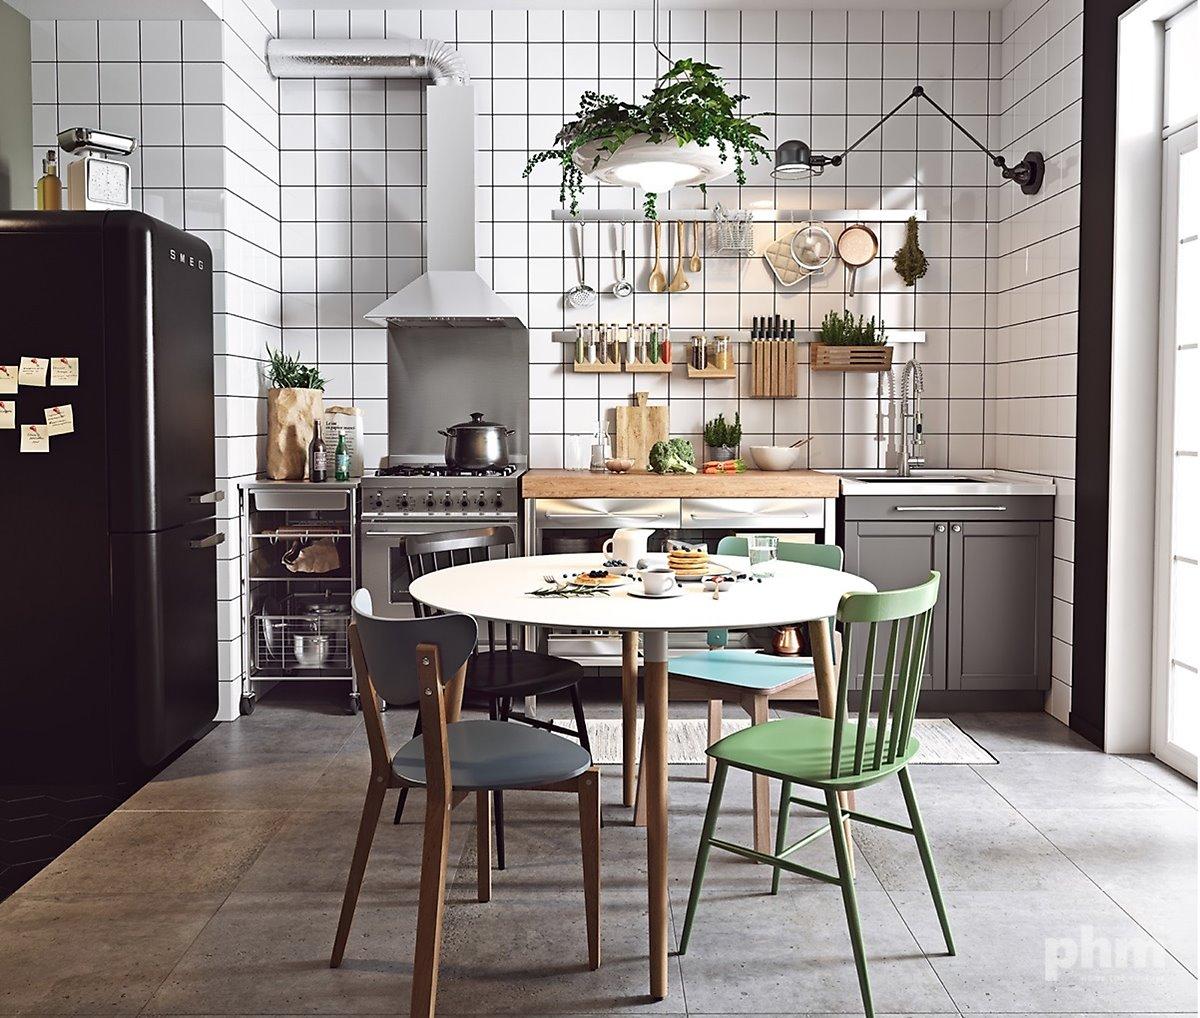 Bohemian Dining Room 북유럽 스타일로 나만의 주방을 꾸미는 인테리어 팁 문화가 있는 집 Phm Zine